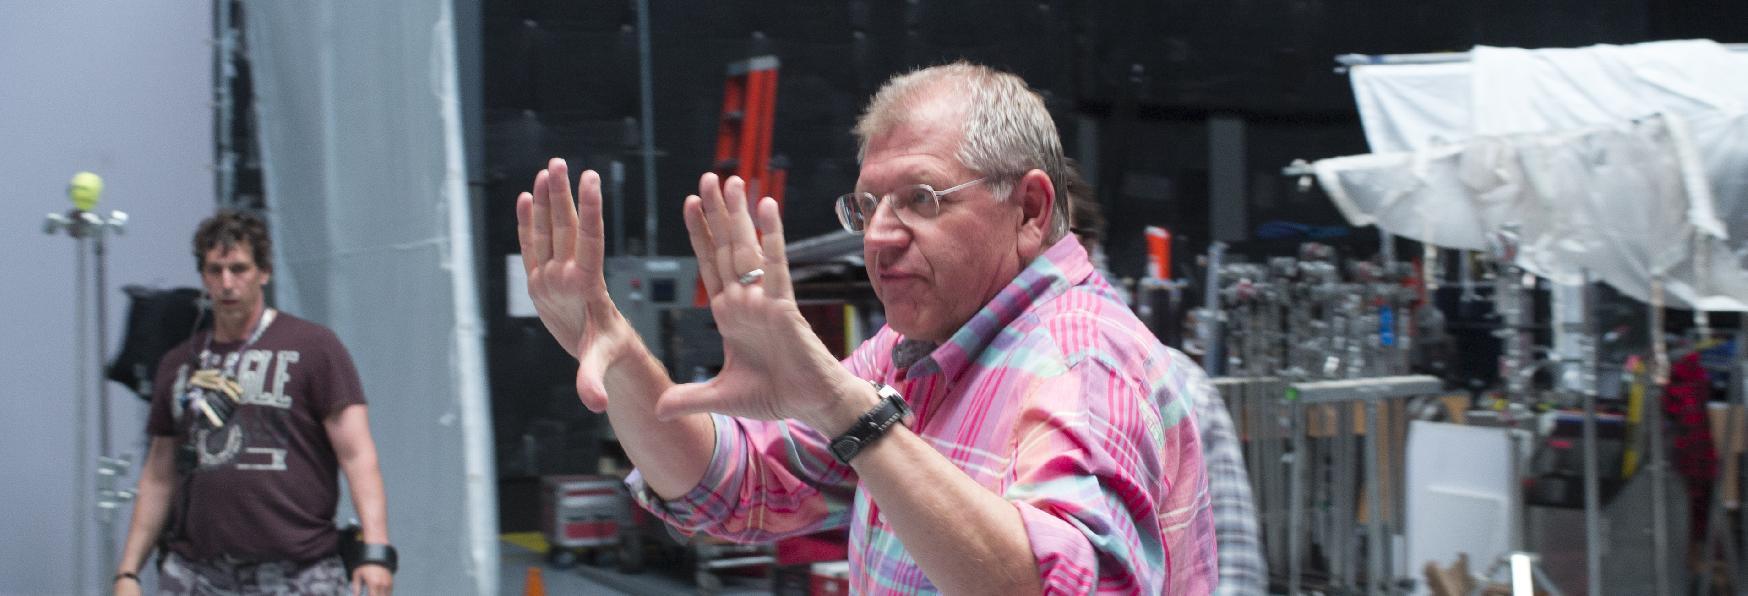 Robert Zemeckis regista della Serie Live Action sui The Jetsons